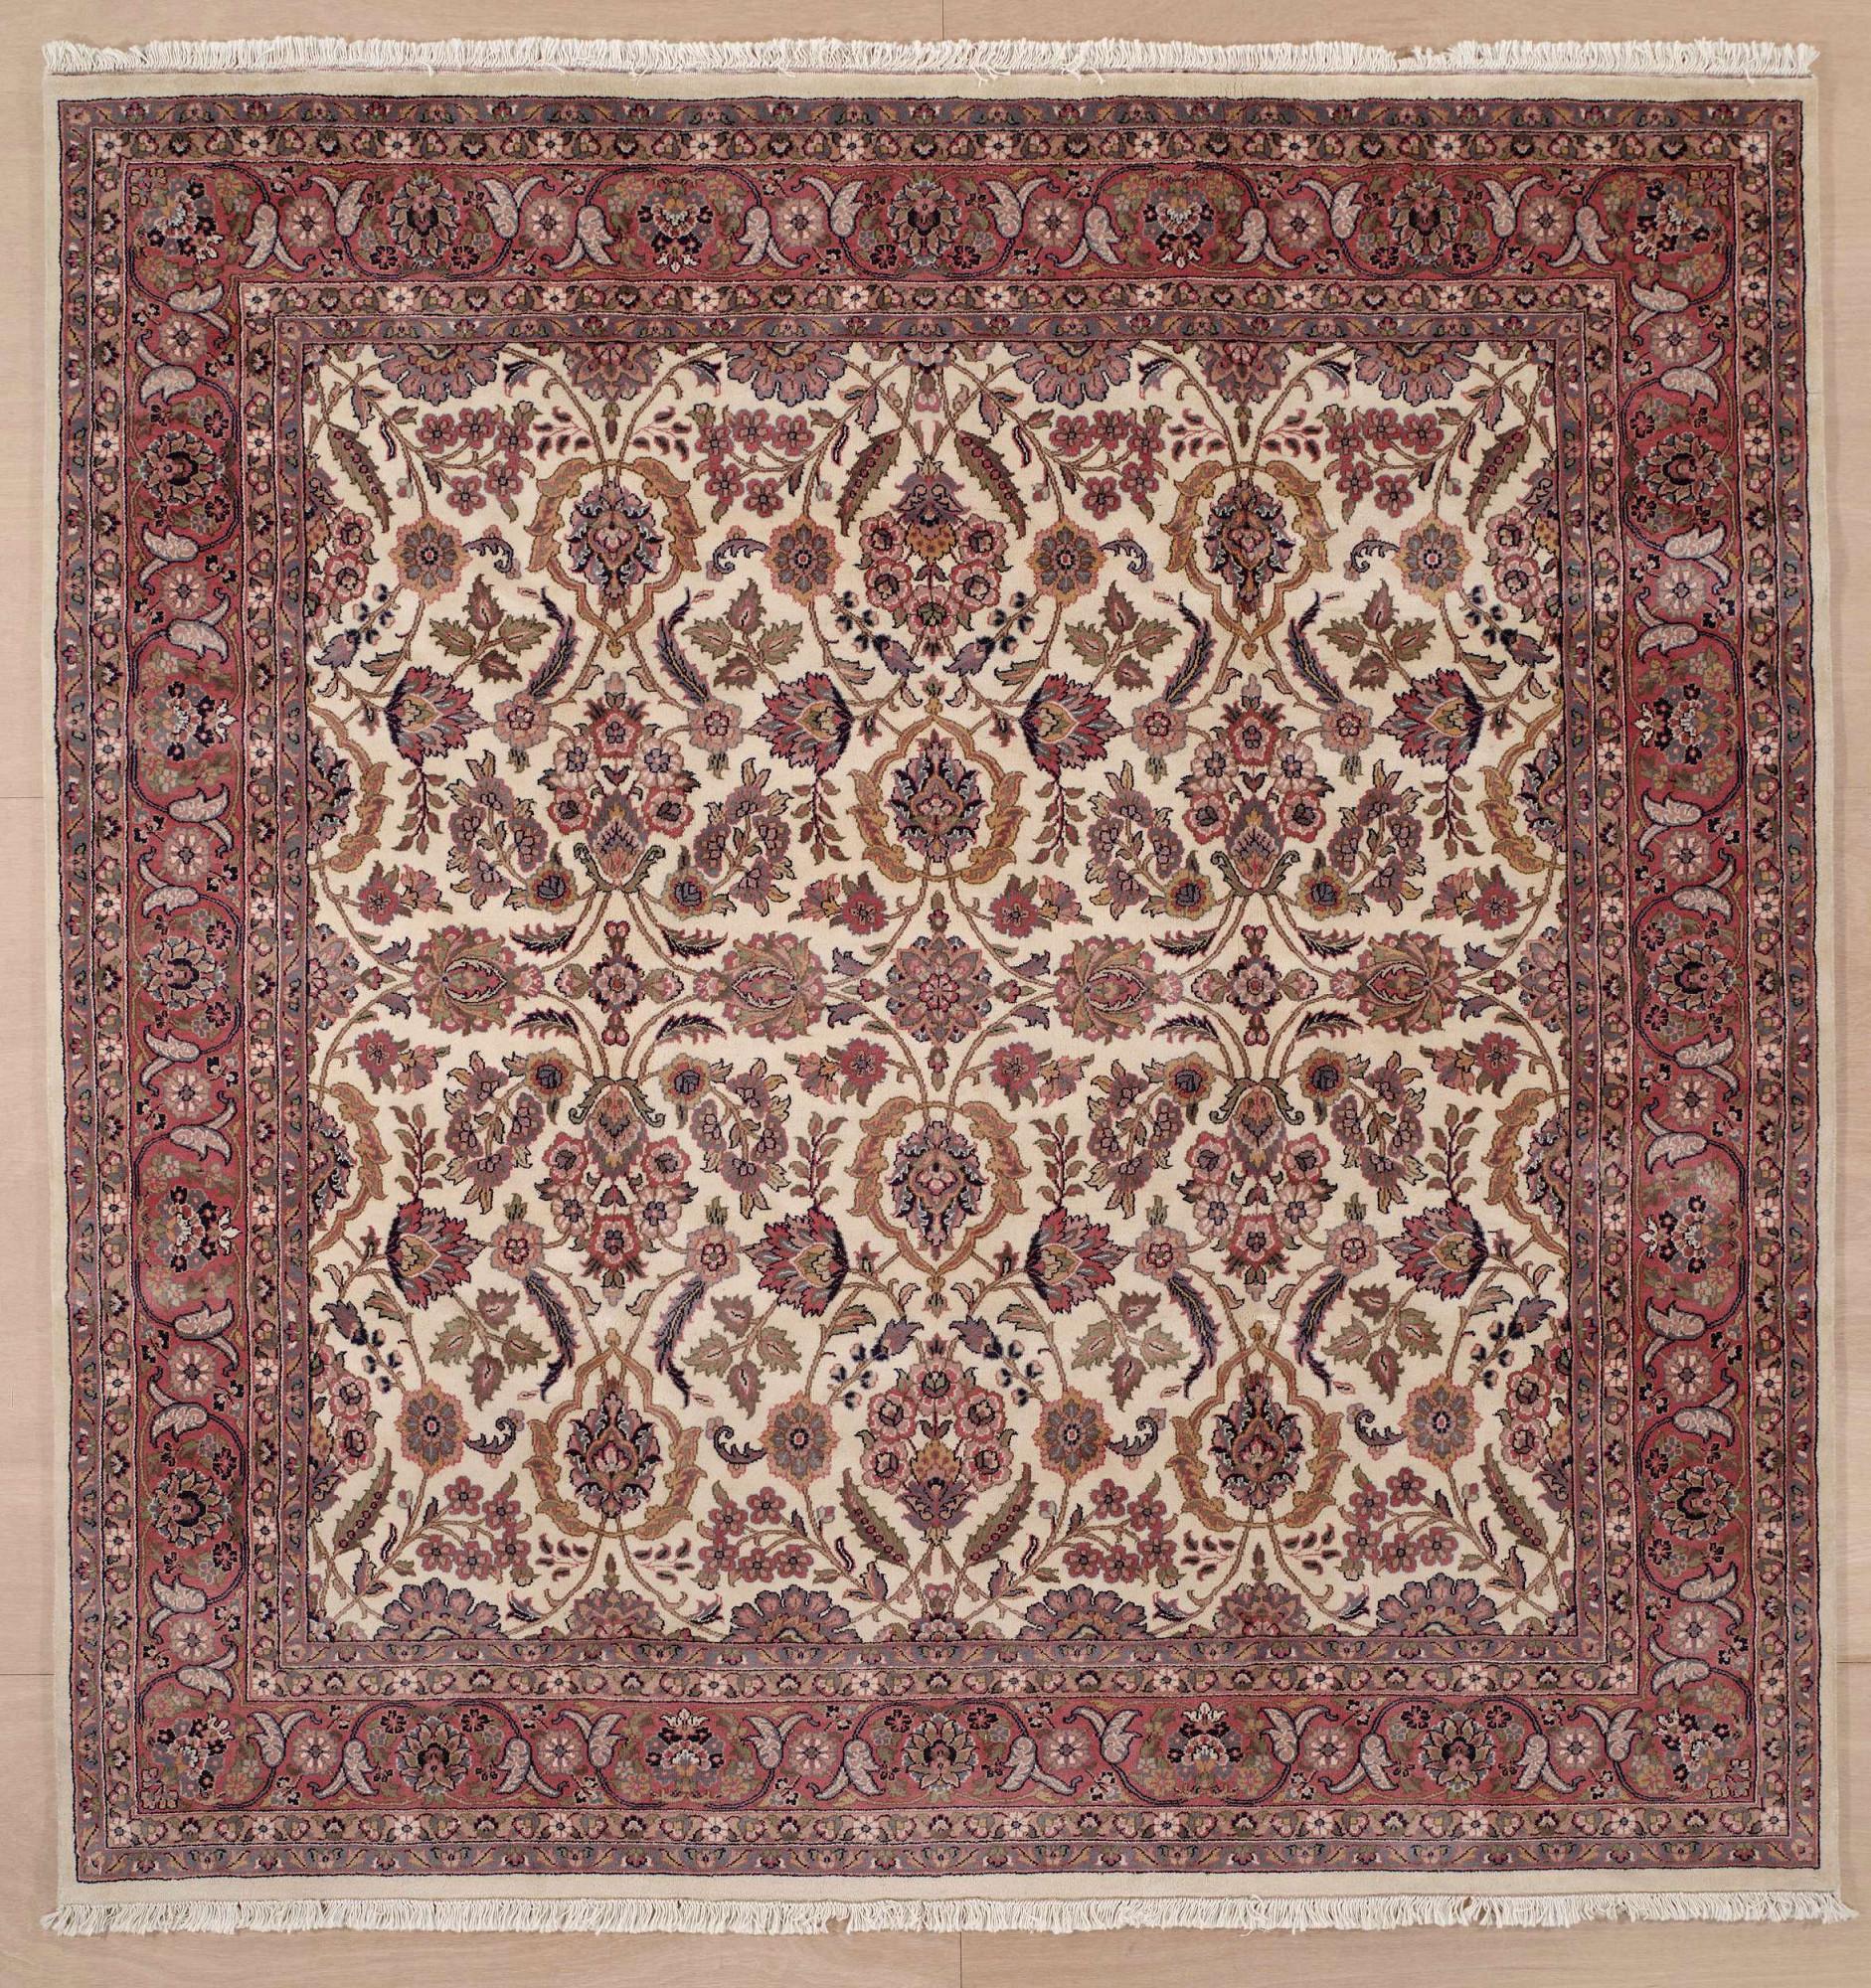 Agra Rectangle 8x8